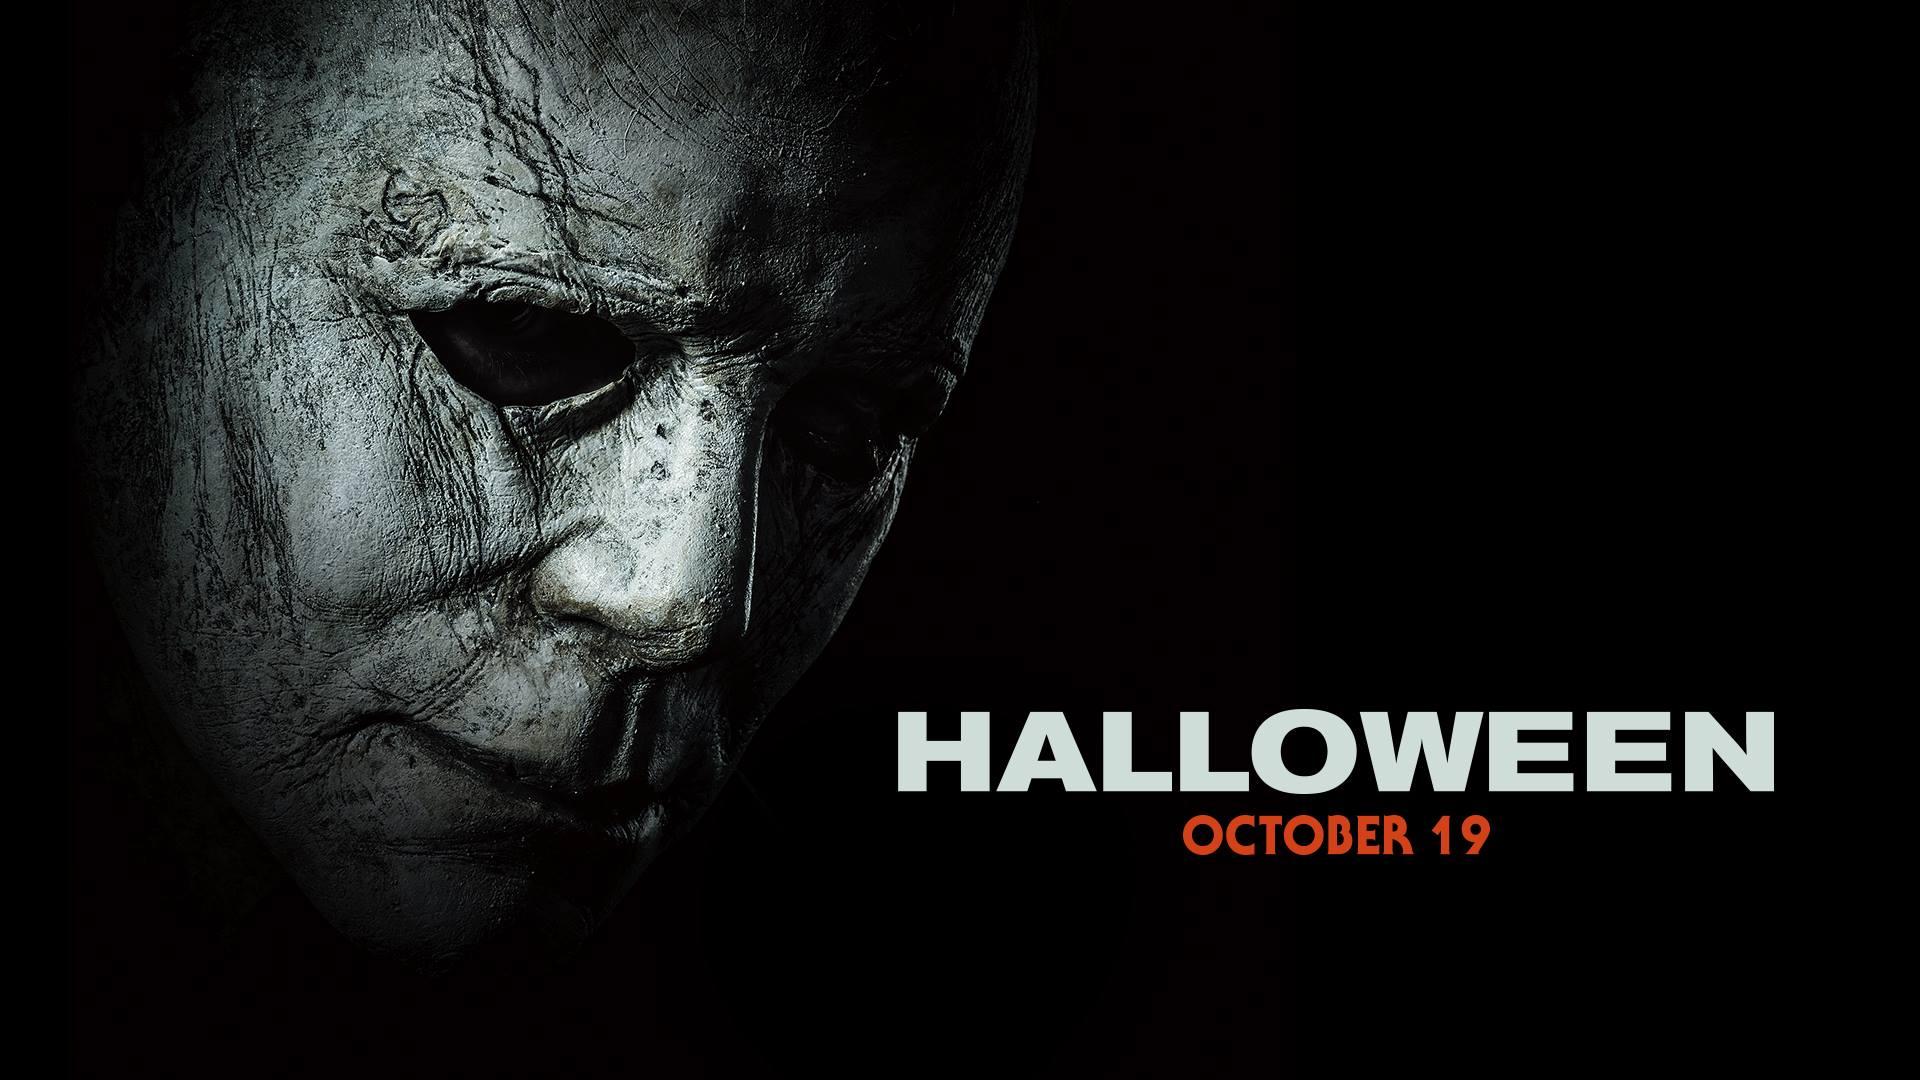 Halloween-2018-banner.jpg?fit=1920,1080&